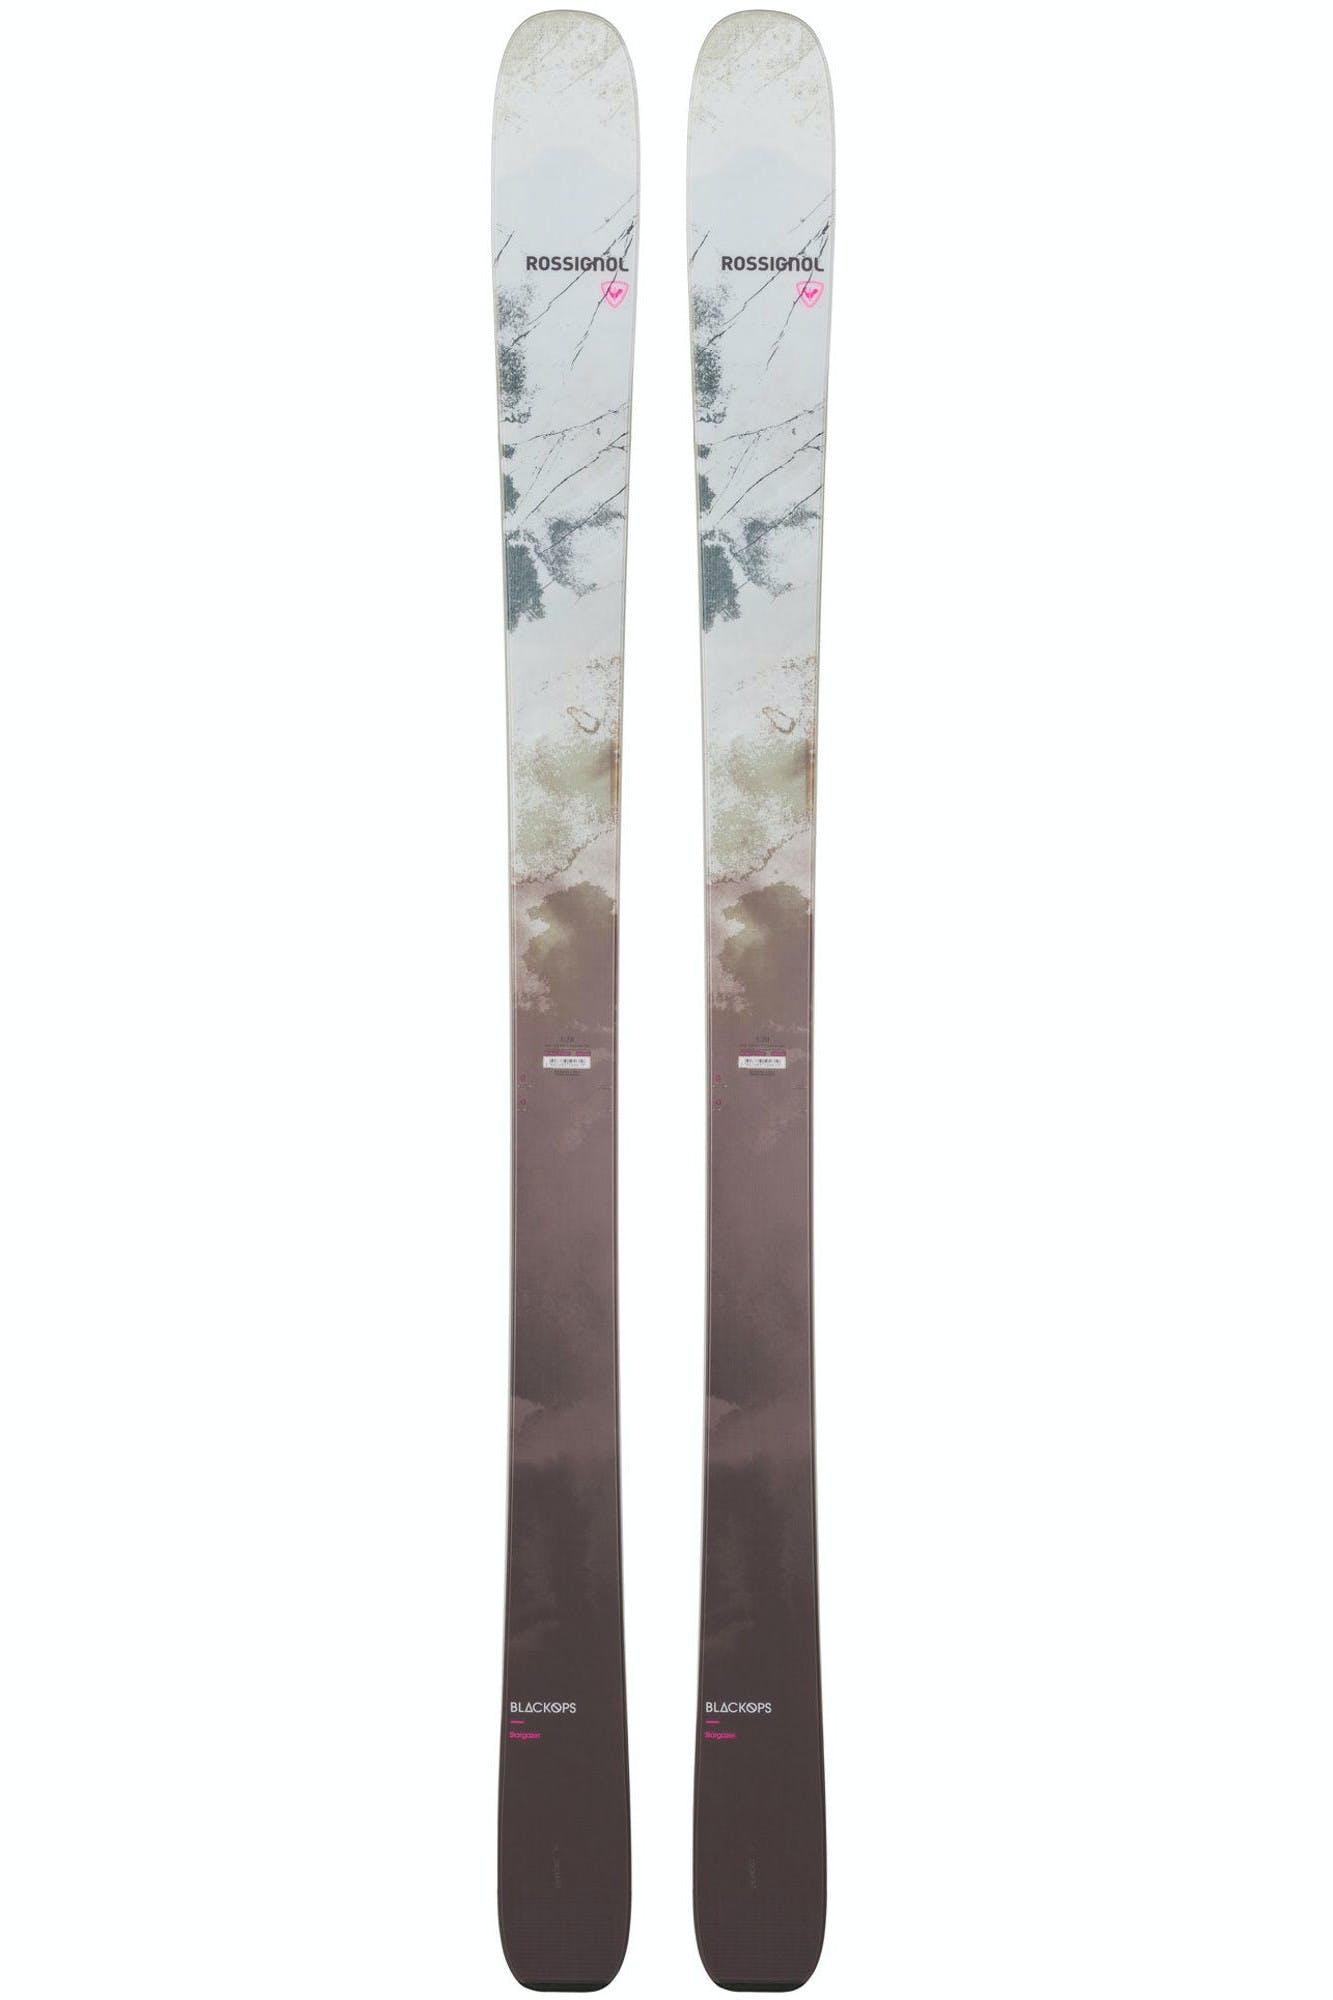 Rossignol Blackops Stargazer Skis Women's · 2021